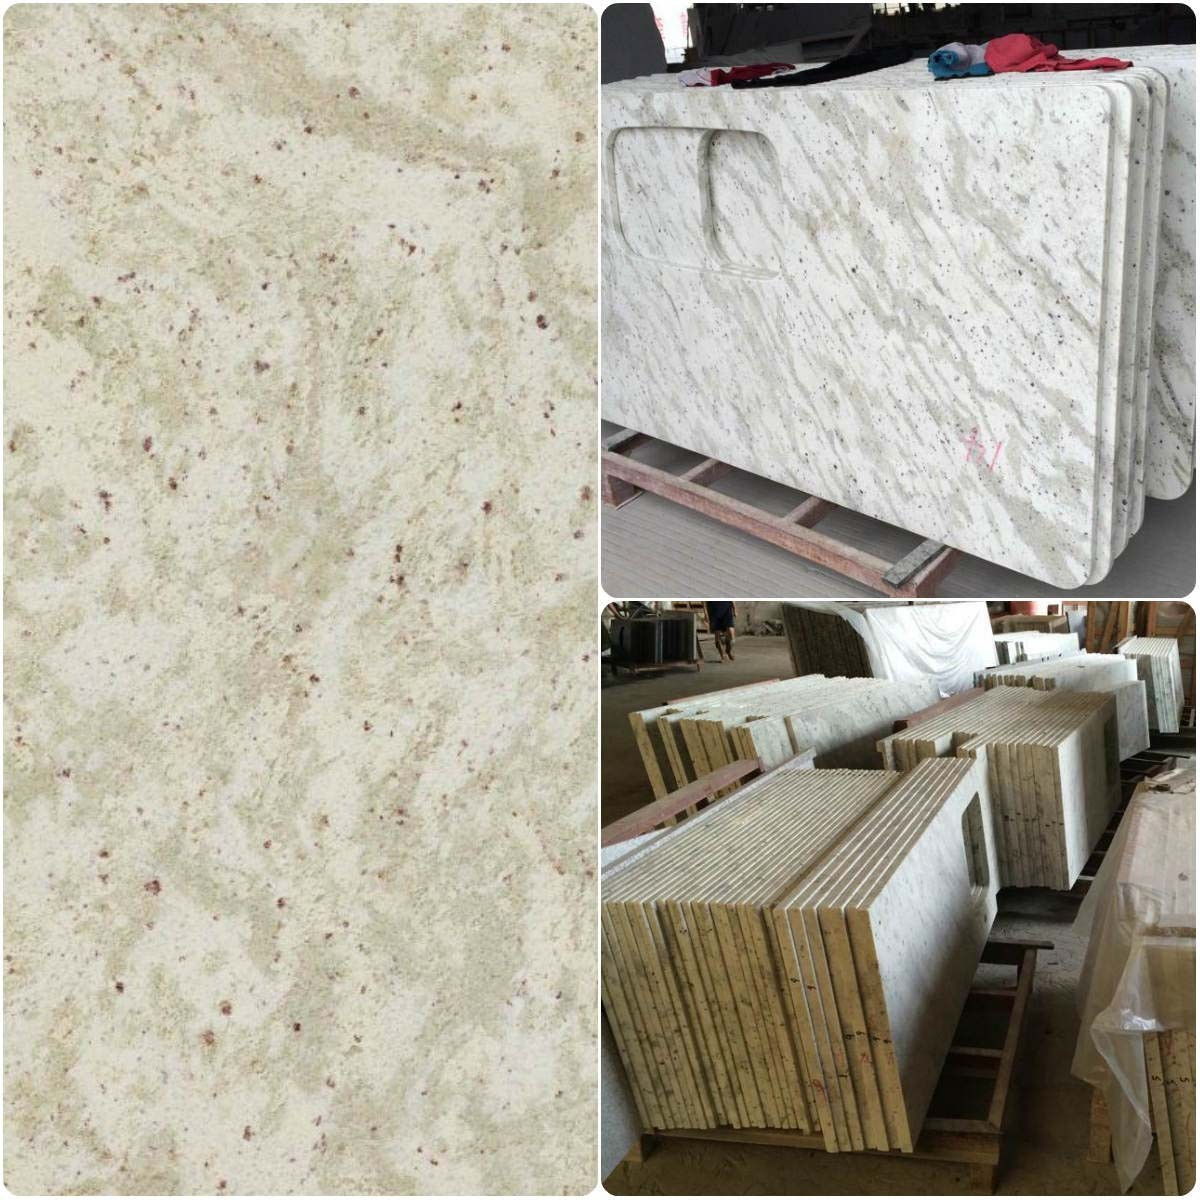 Andrameda kashimire White granite countertops